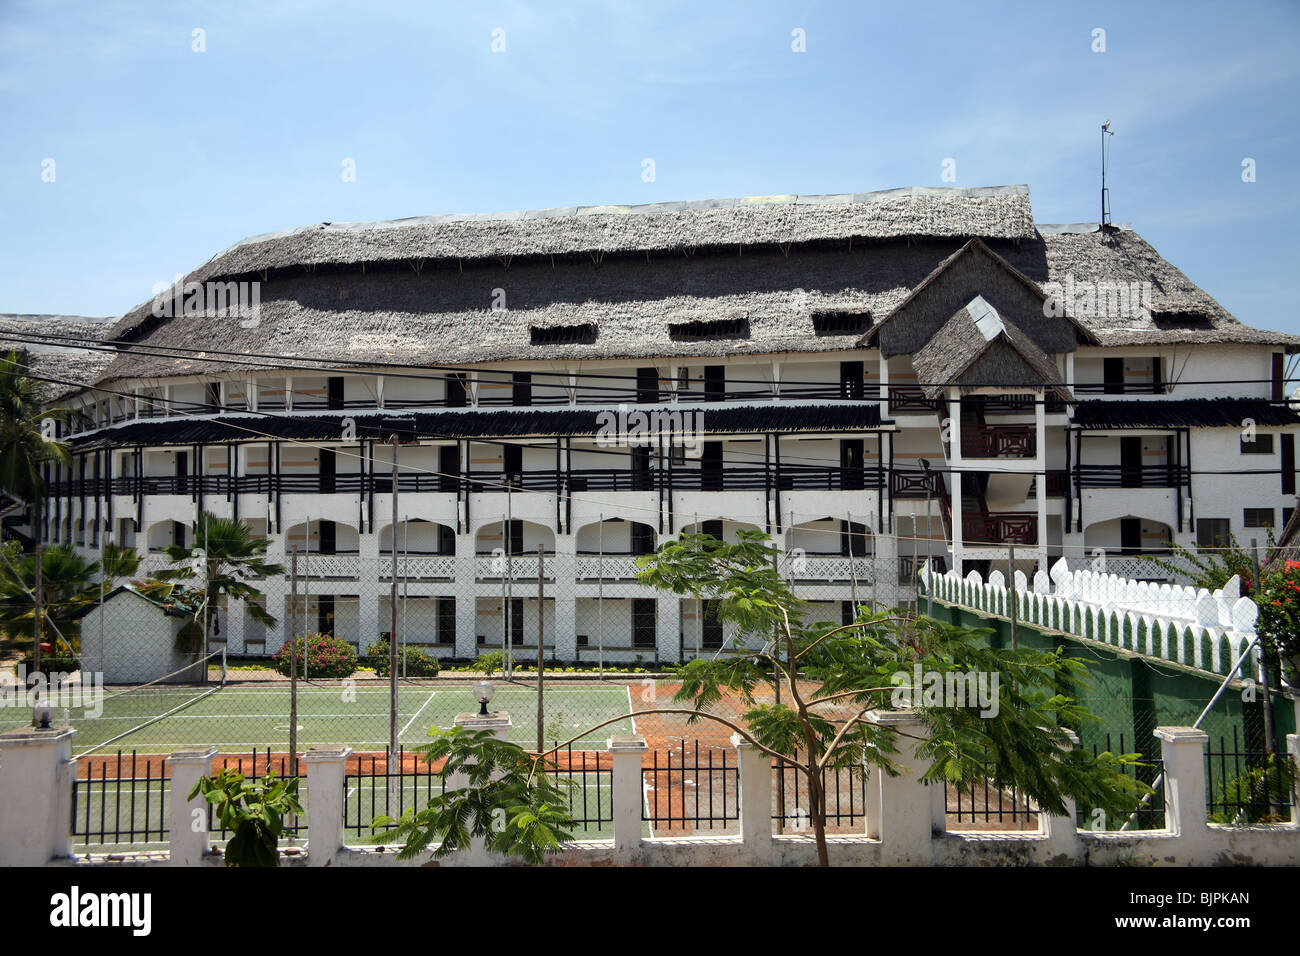 Large hotel complex, beach road Diani beach Kenya - Stock Image